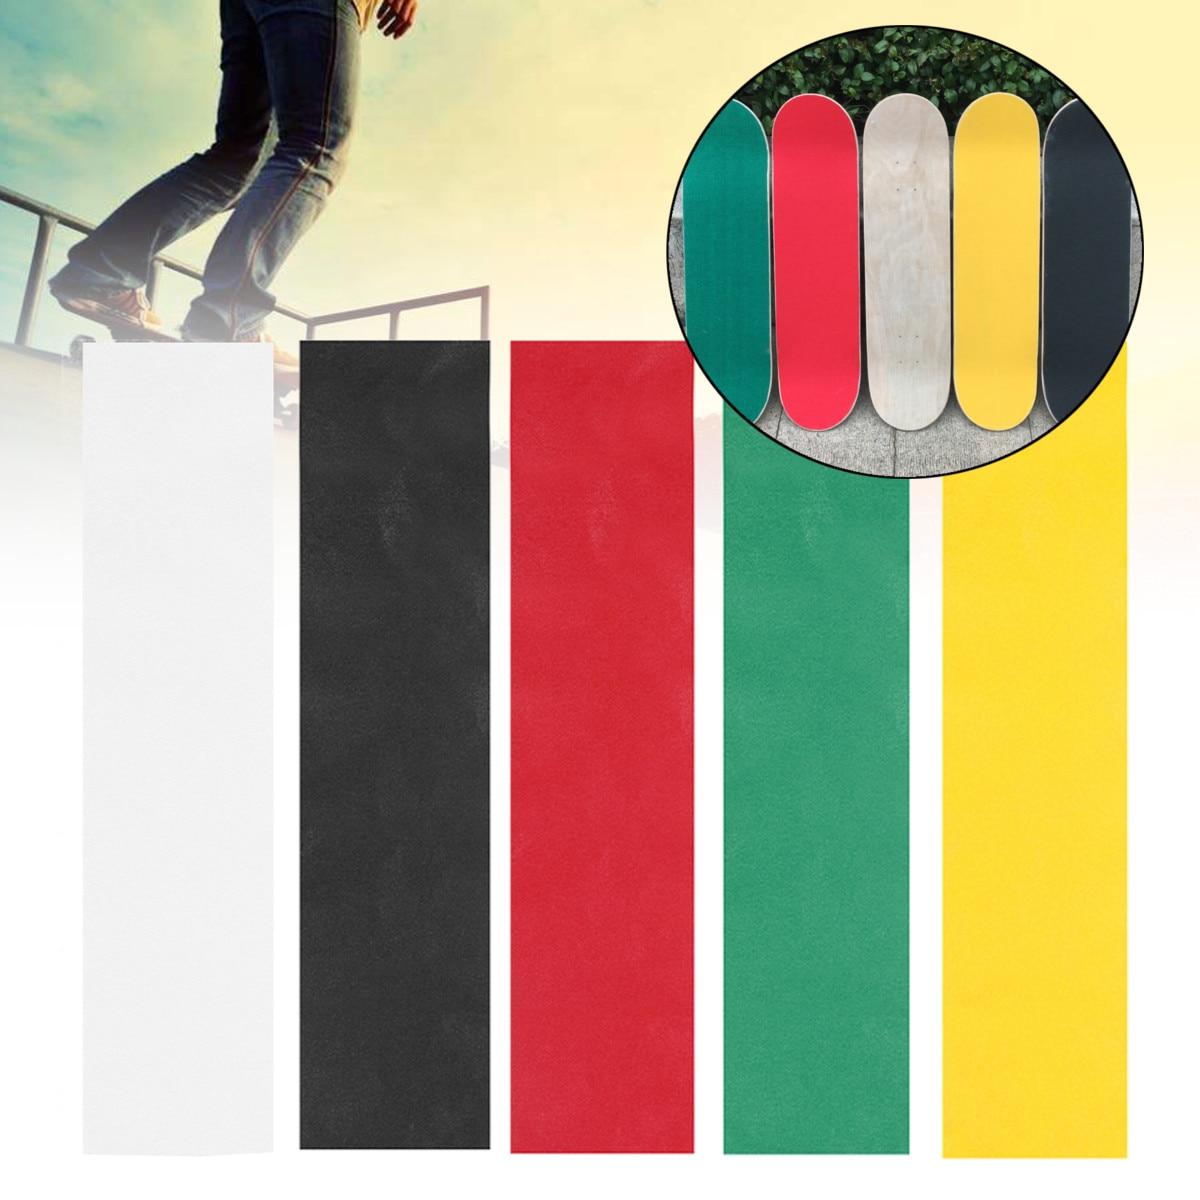 Colorful Skateboard Deck Sandpaper Grip Tape Griptape Skating Board Sticker